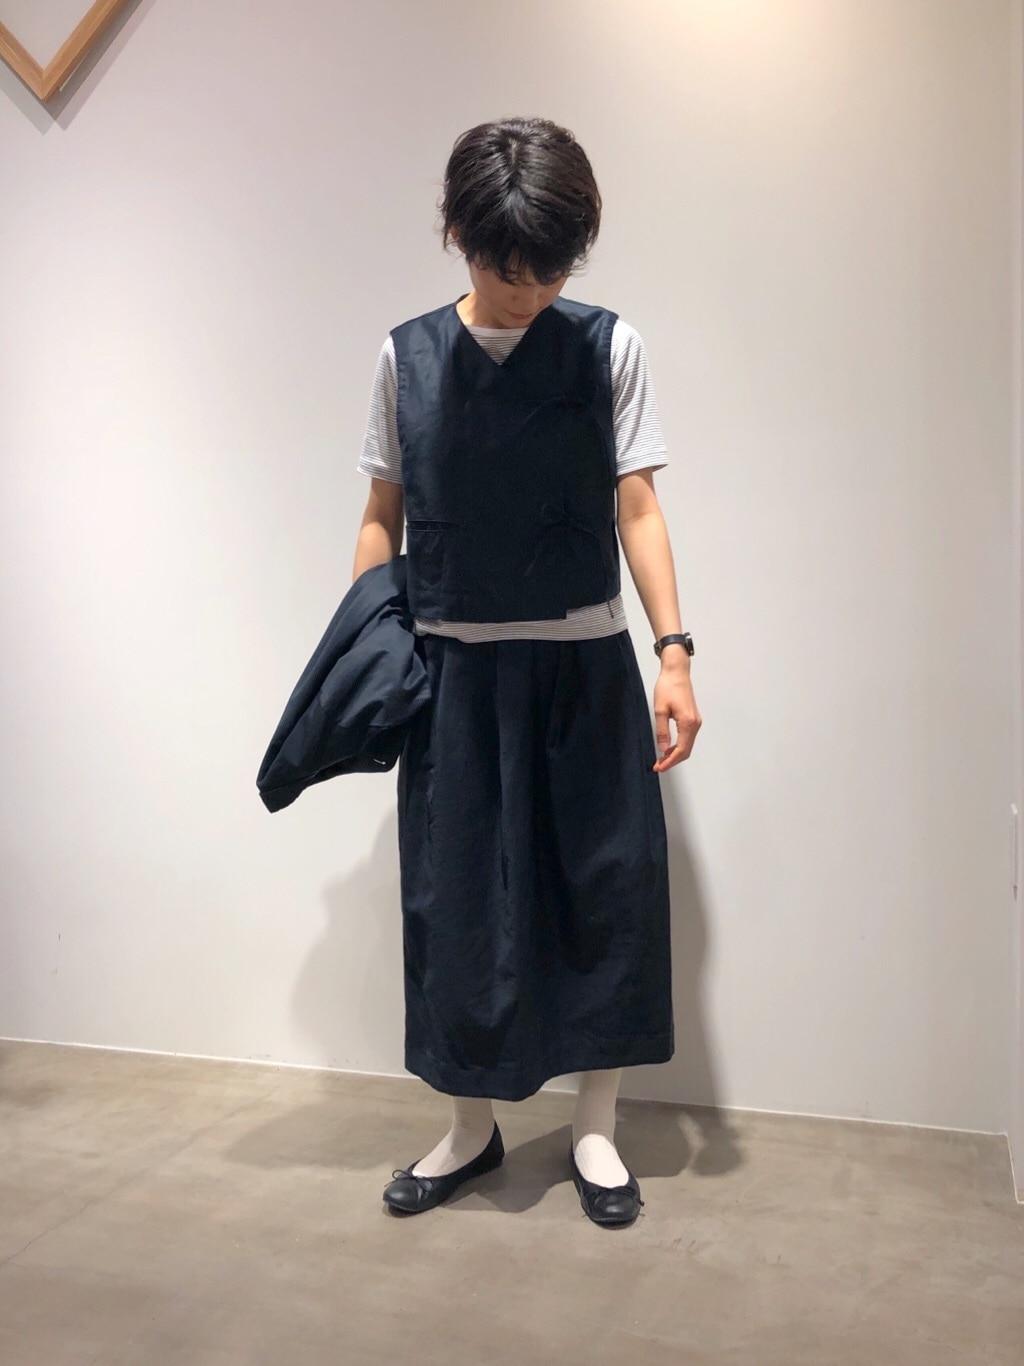 yuni / bulle de savon 京都路面 身長:158cm 2020.05.01